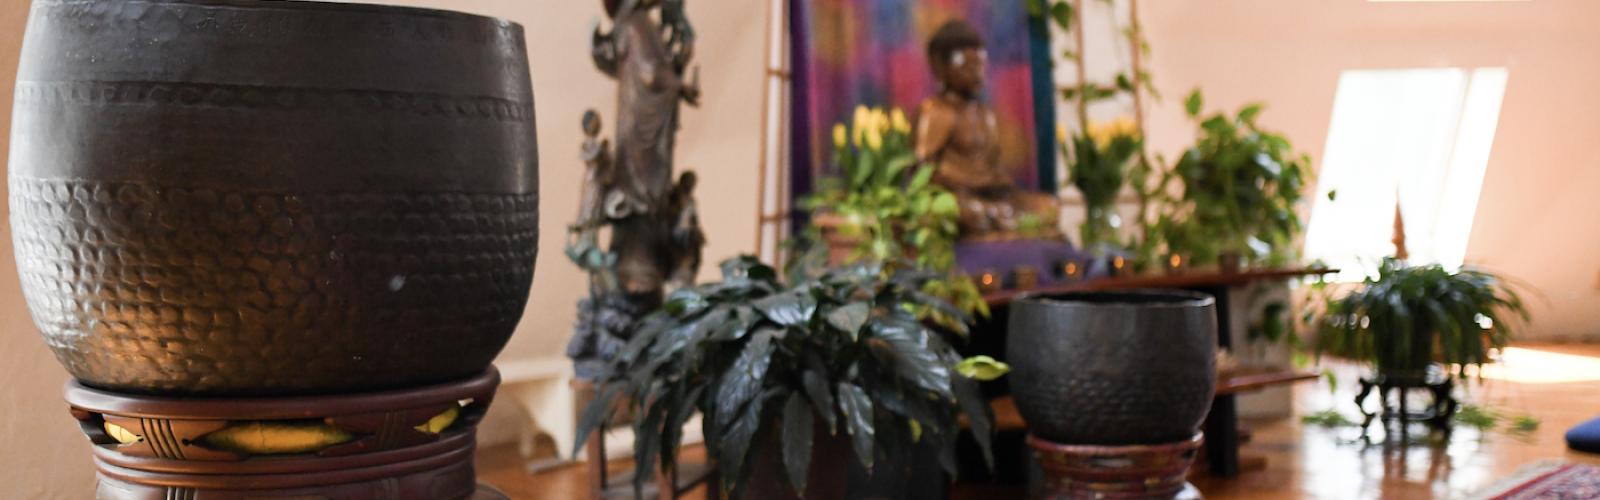 the aryaloka shrine room